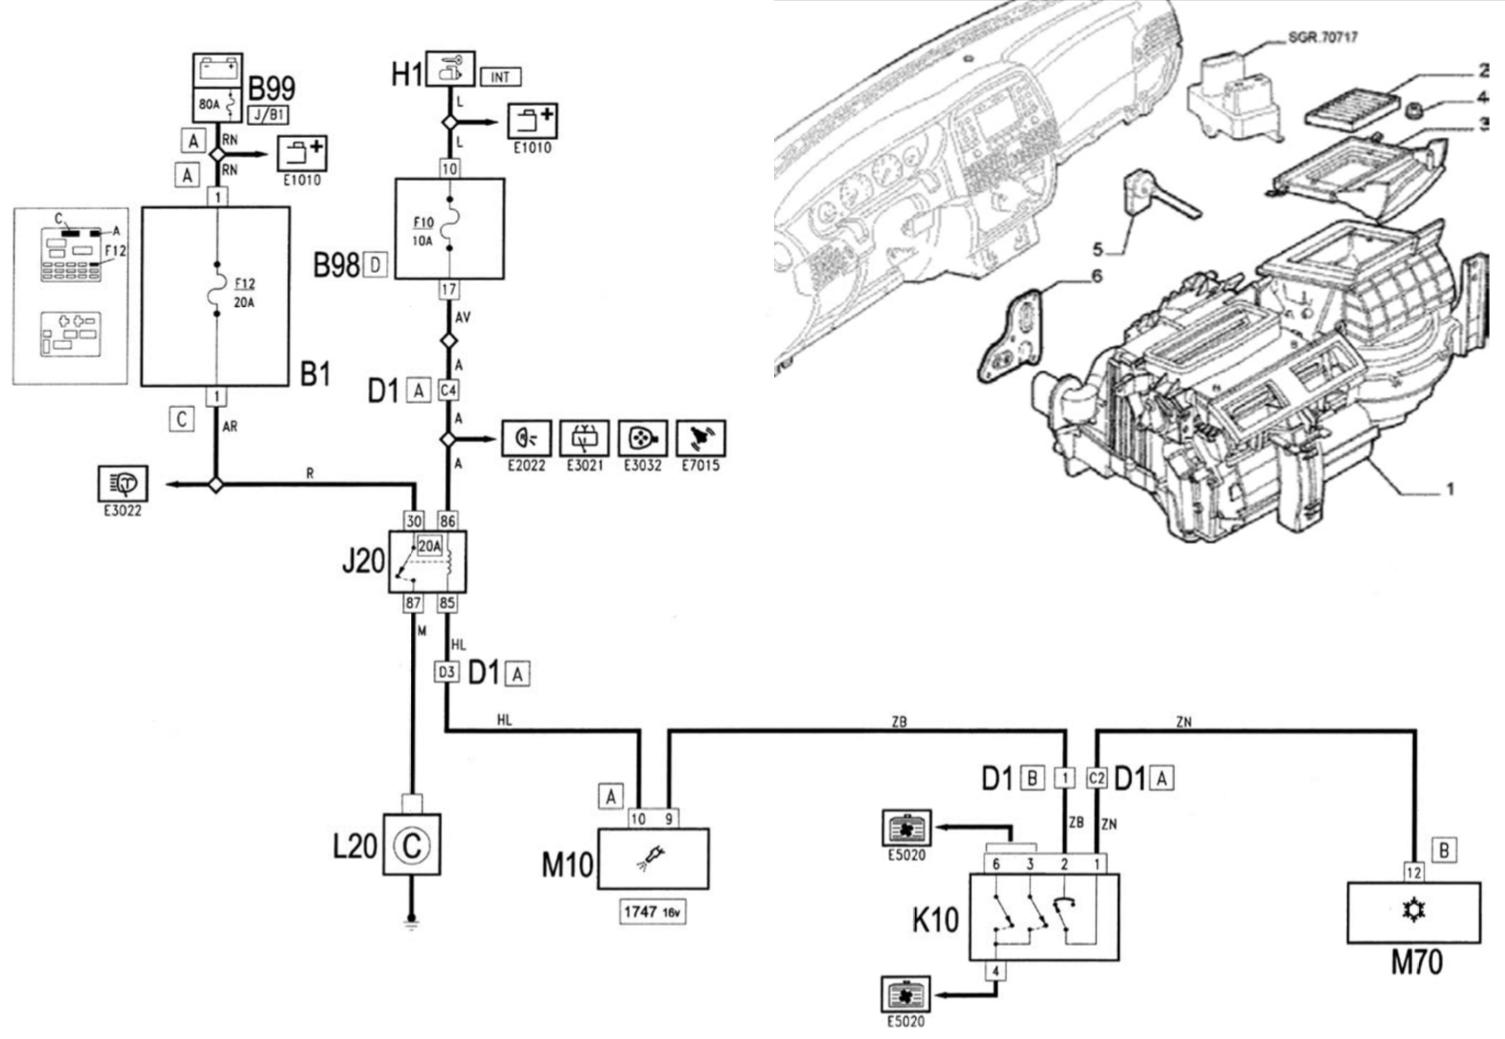 Audi a4 klíma vezérlő hiba